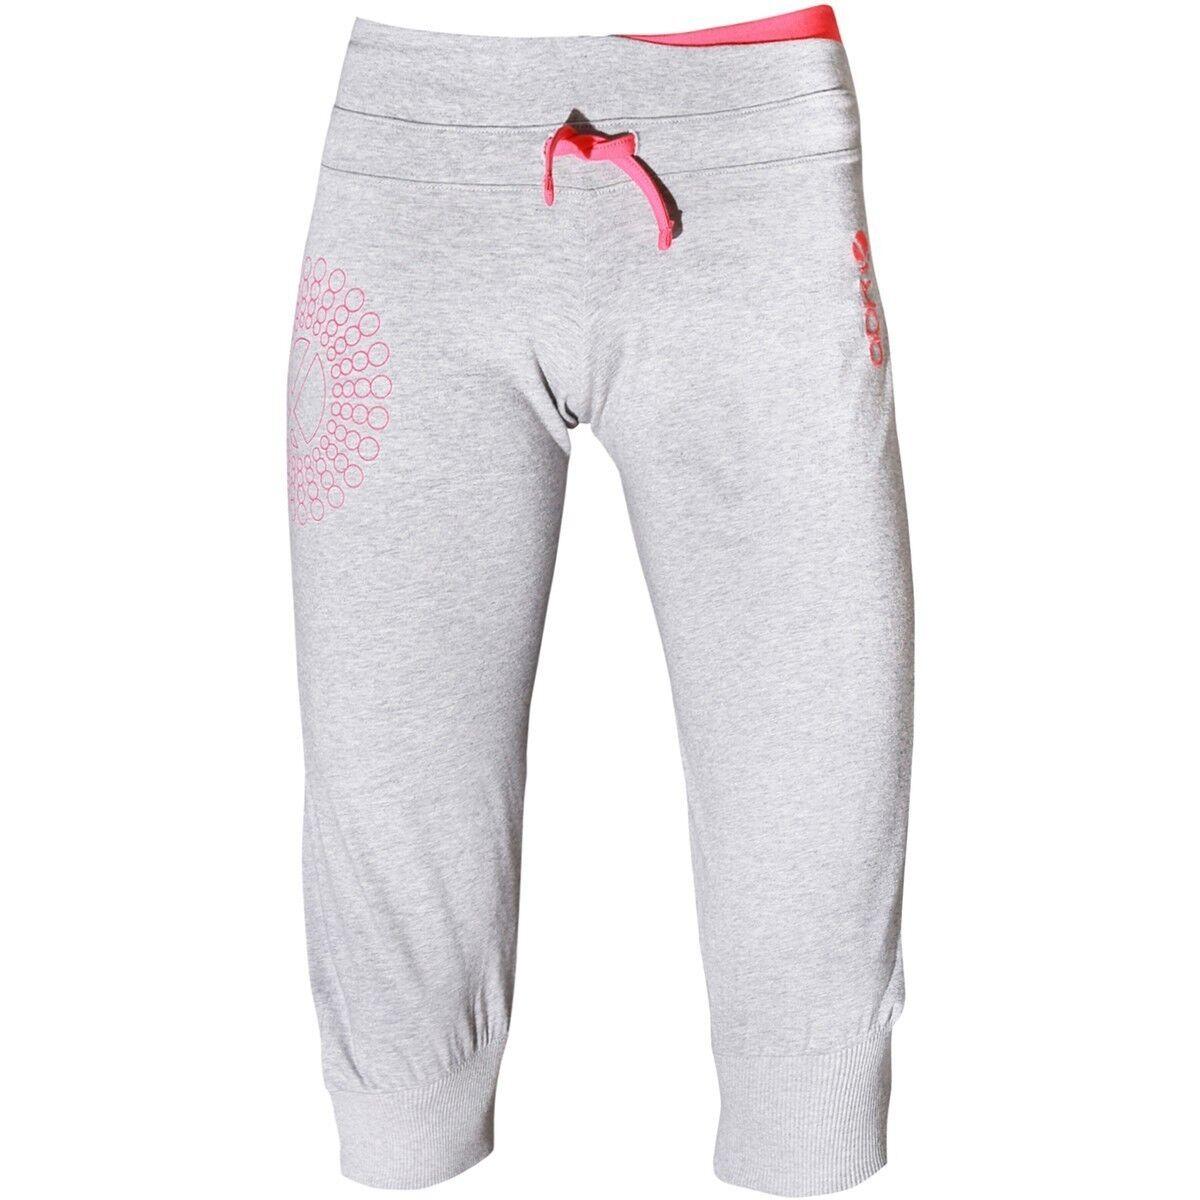 ABK Stretch 3 4 V2 Pant Women's, Grey,  Elastic Women's Pants  order now